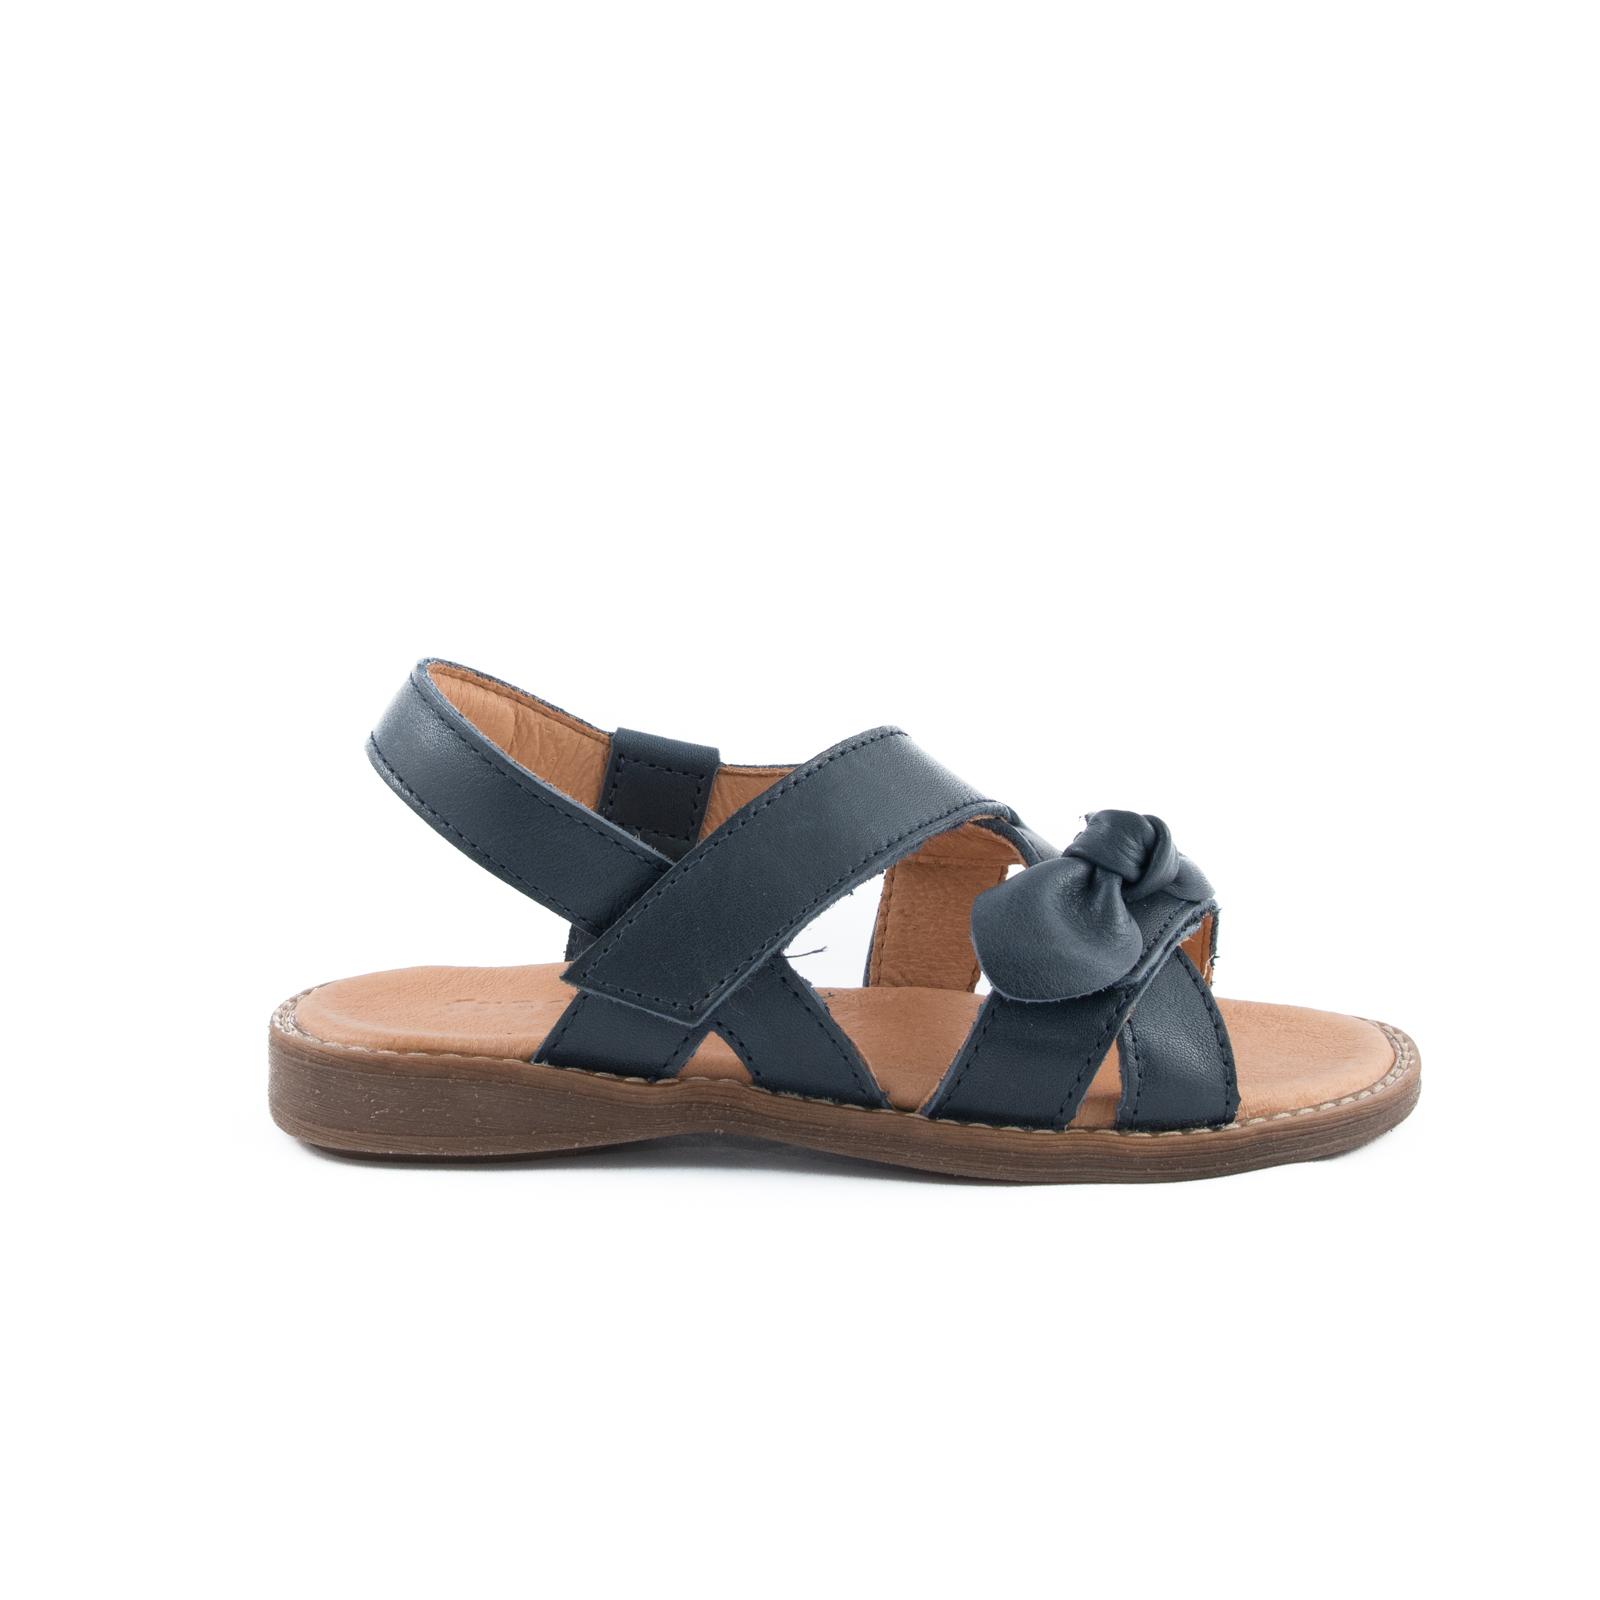 FRODDO GIRLS Sandals Navy G3150133-5